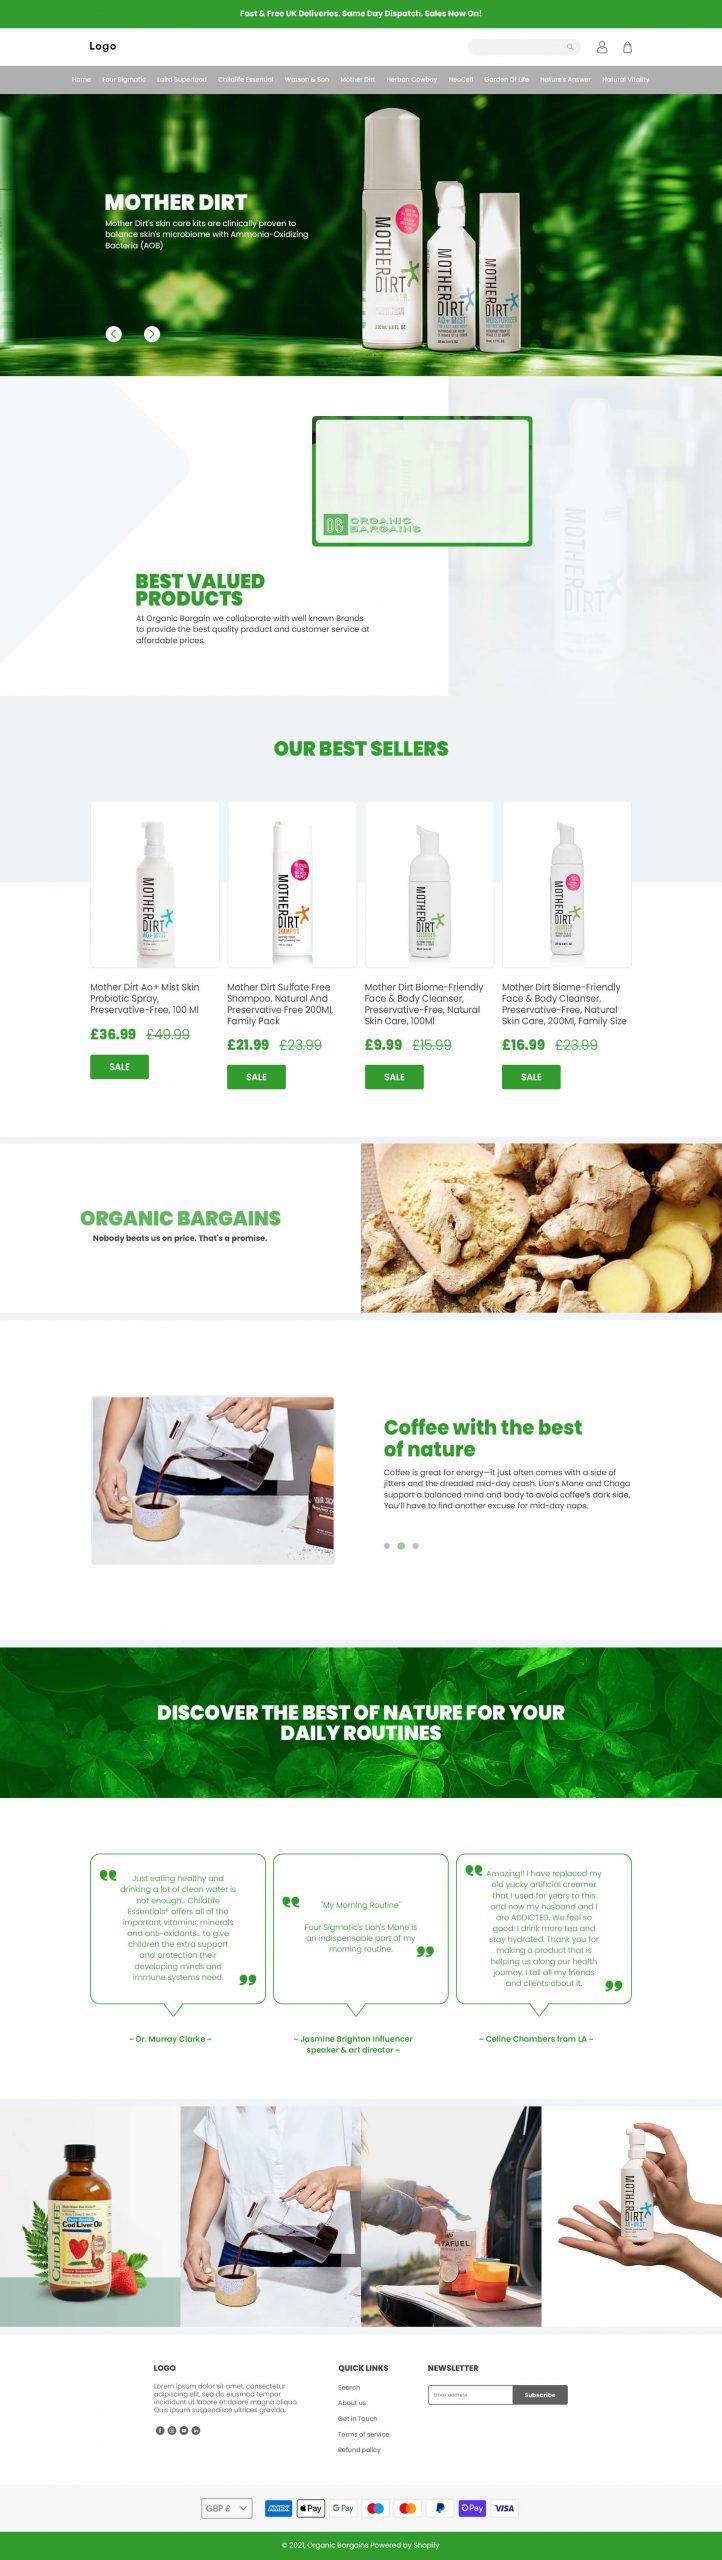 Organic Bargains